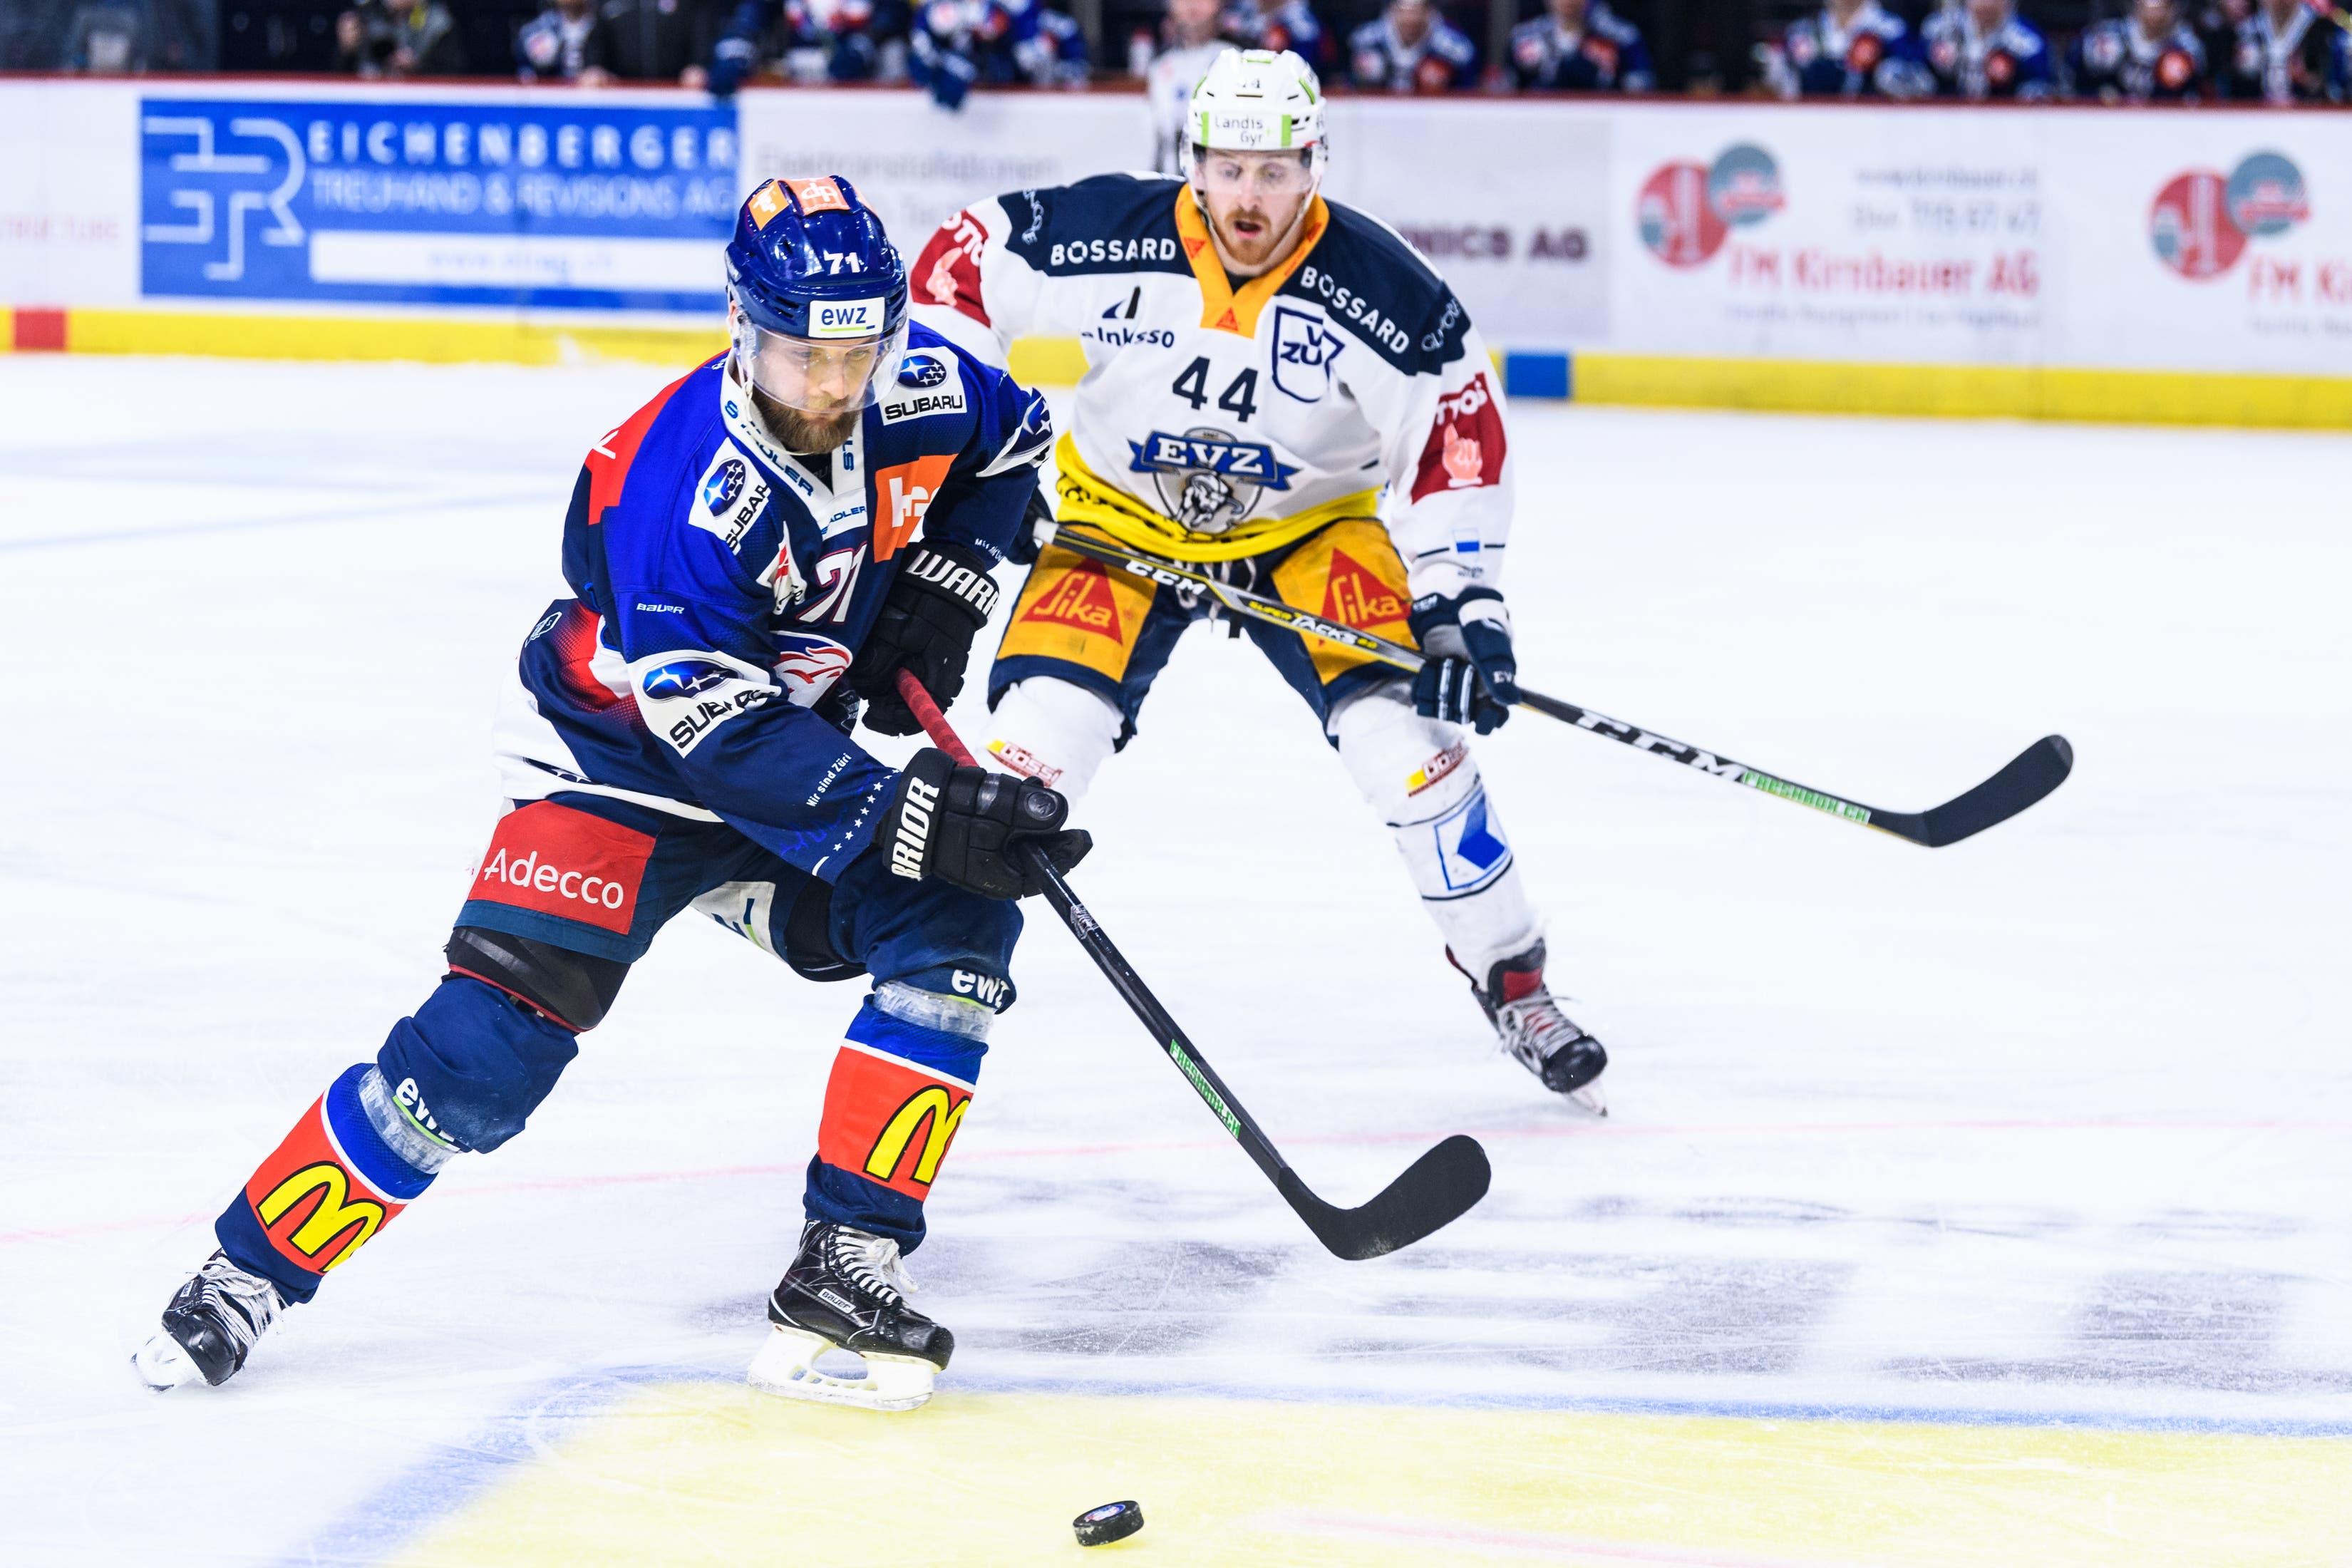 25.01.2019; Zuerich; Eishockey National League - ZSC Lions - EV Zug;Fredrik Pettersson (ZSC) gegen Pontus Widerstroem (Zug) (Vedi Galijas/freshfocus)